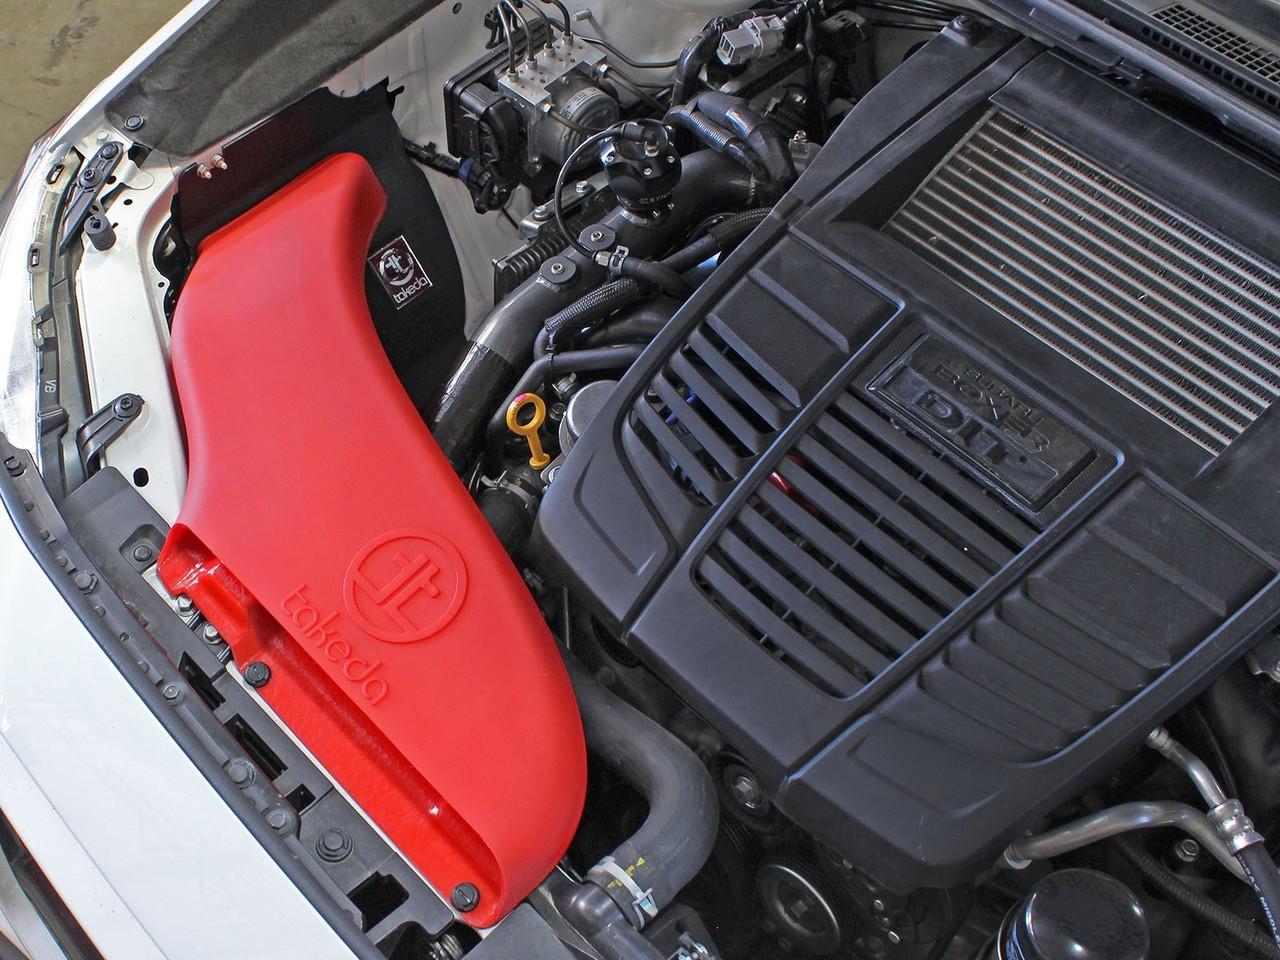 aFe POWER TA-4305B-D Takeda Stage-2 Pro DRY S Cold Air Intake System 15-17 Subaru WRX H4-2.0L (TA-4305B-D)